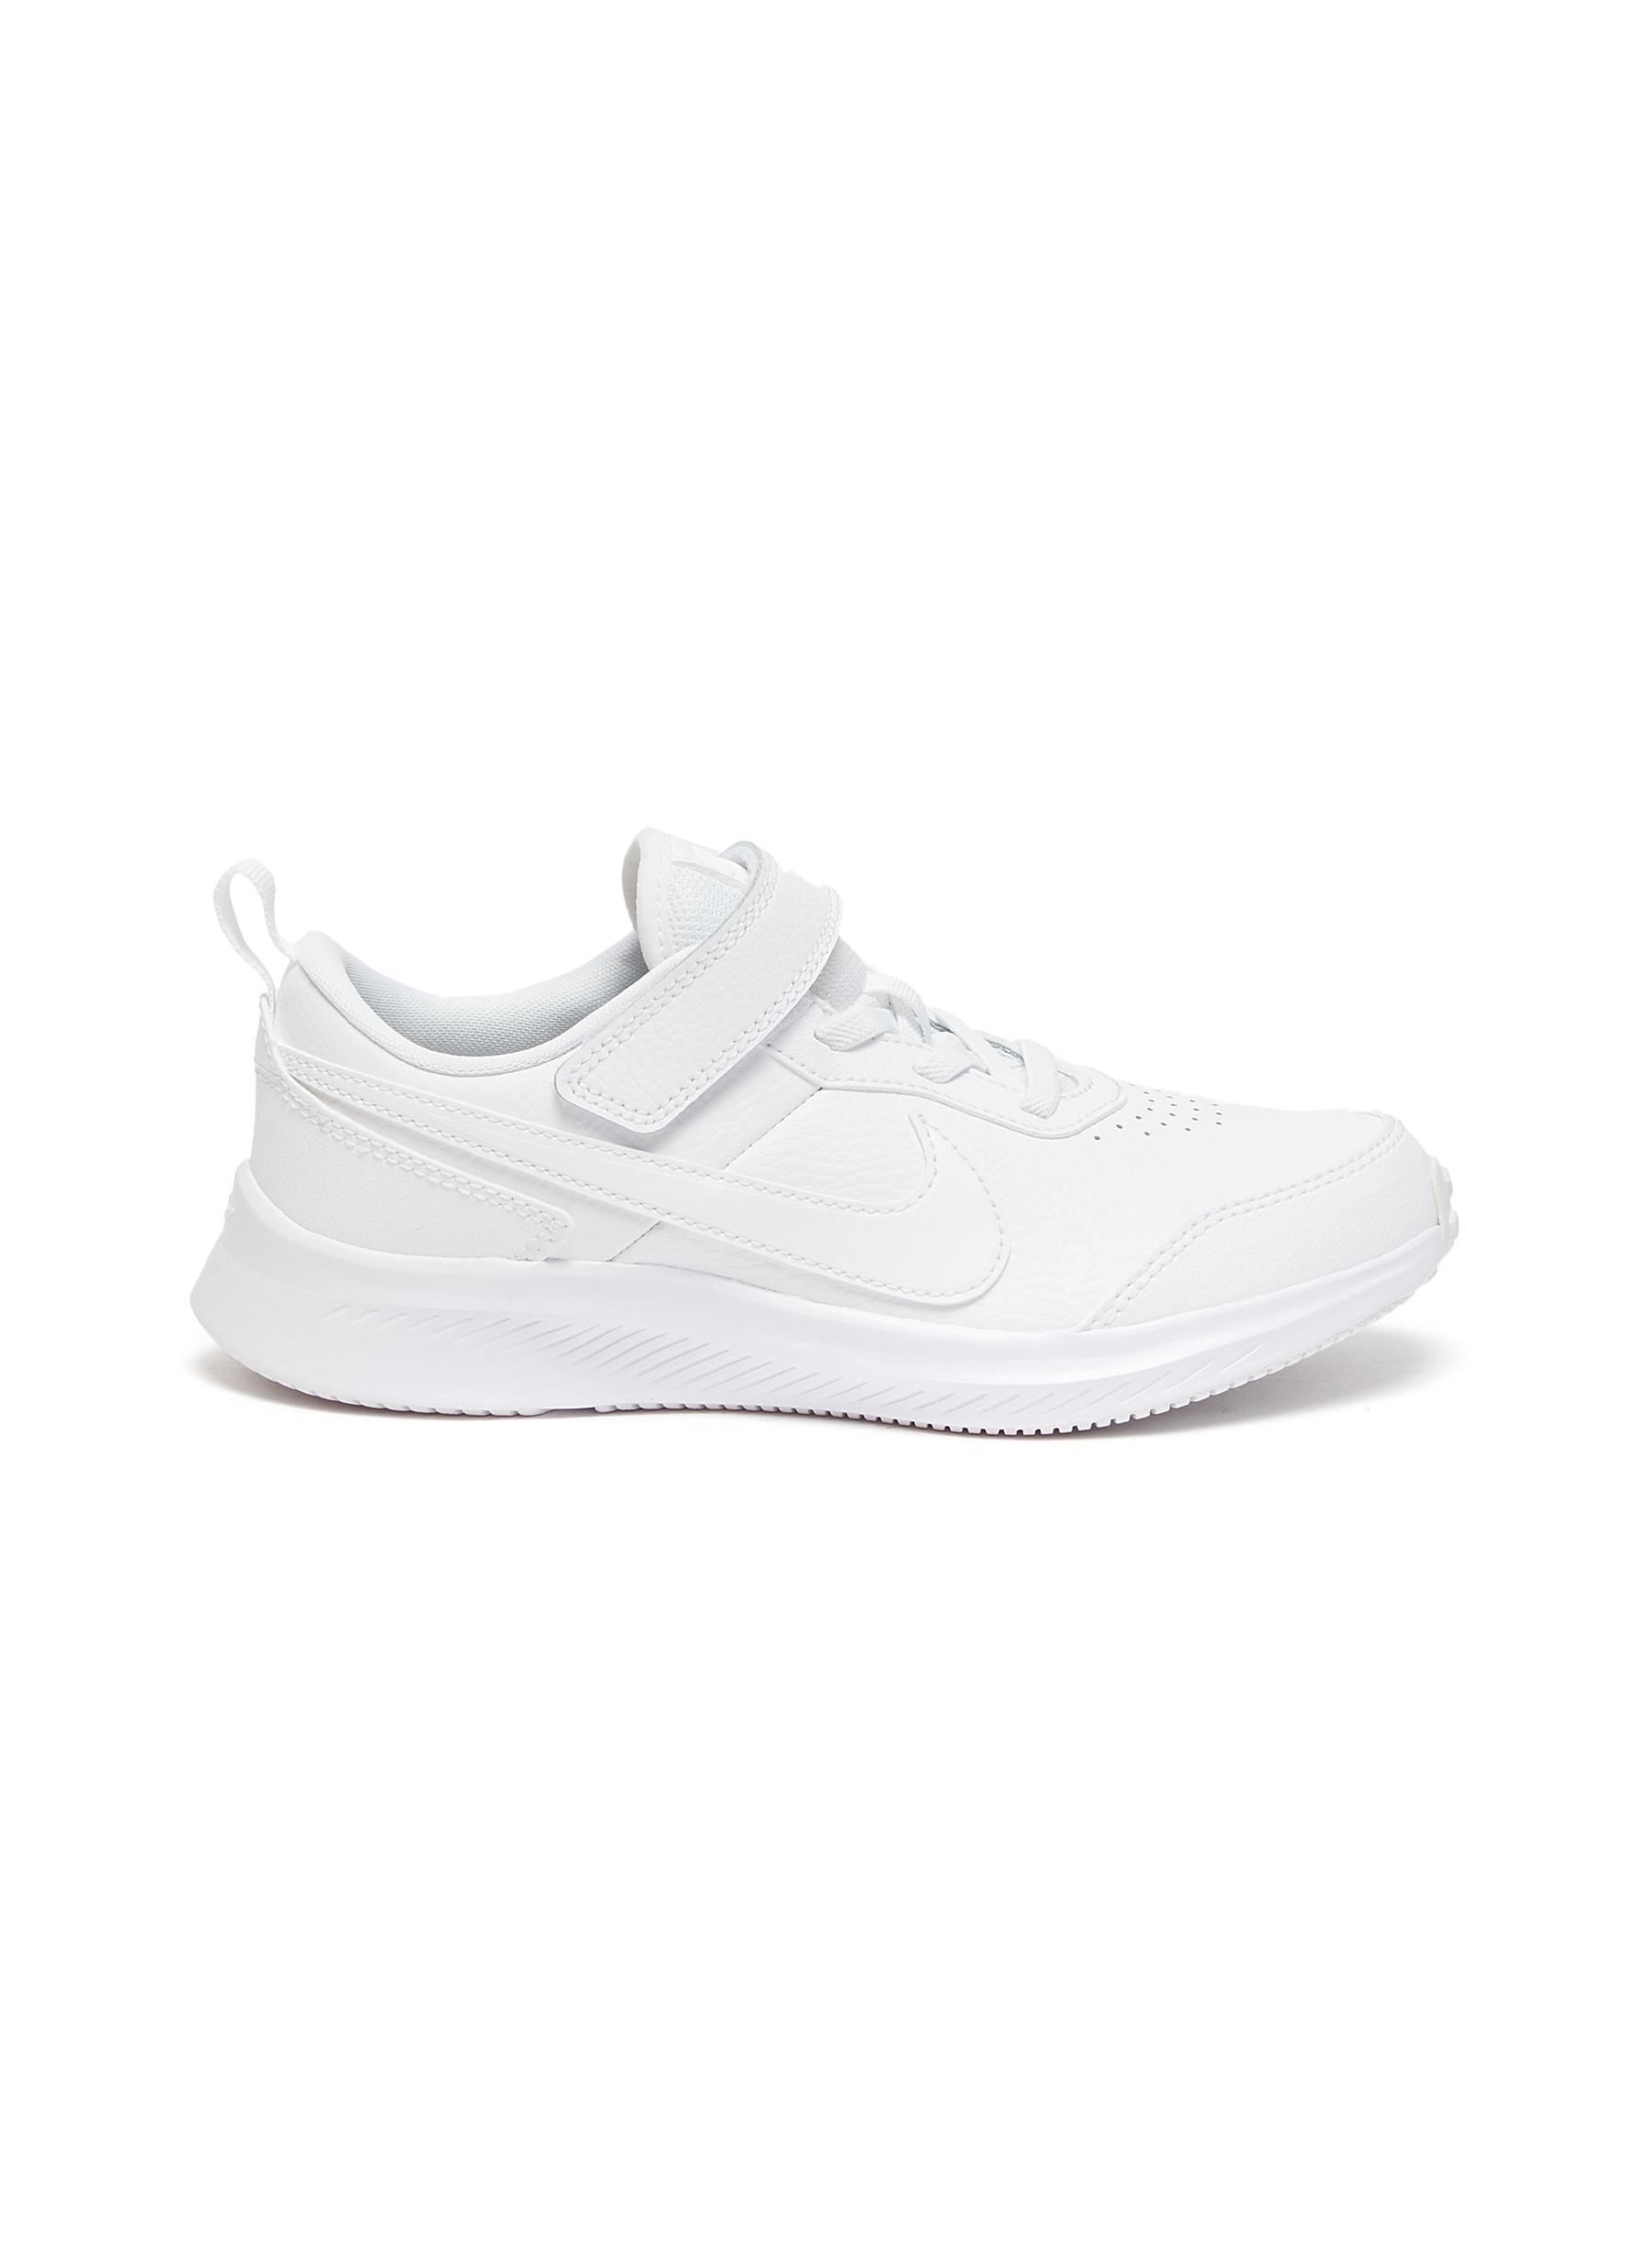 VARSITY' Low Top Kids Leather Sneakers - NIKE KIDS - Modalova